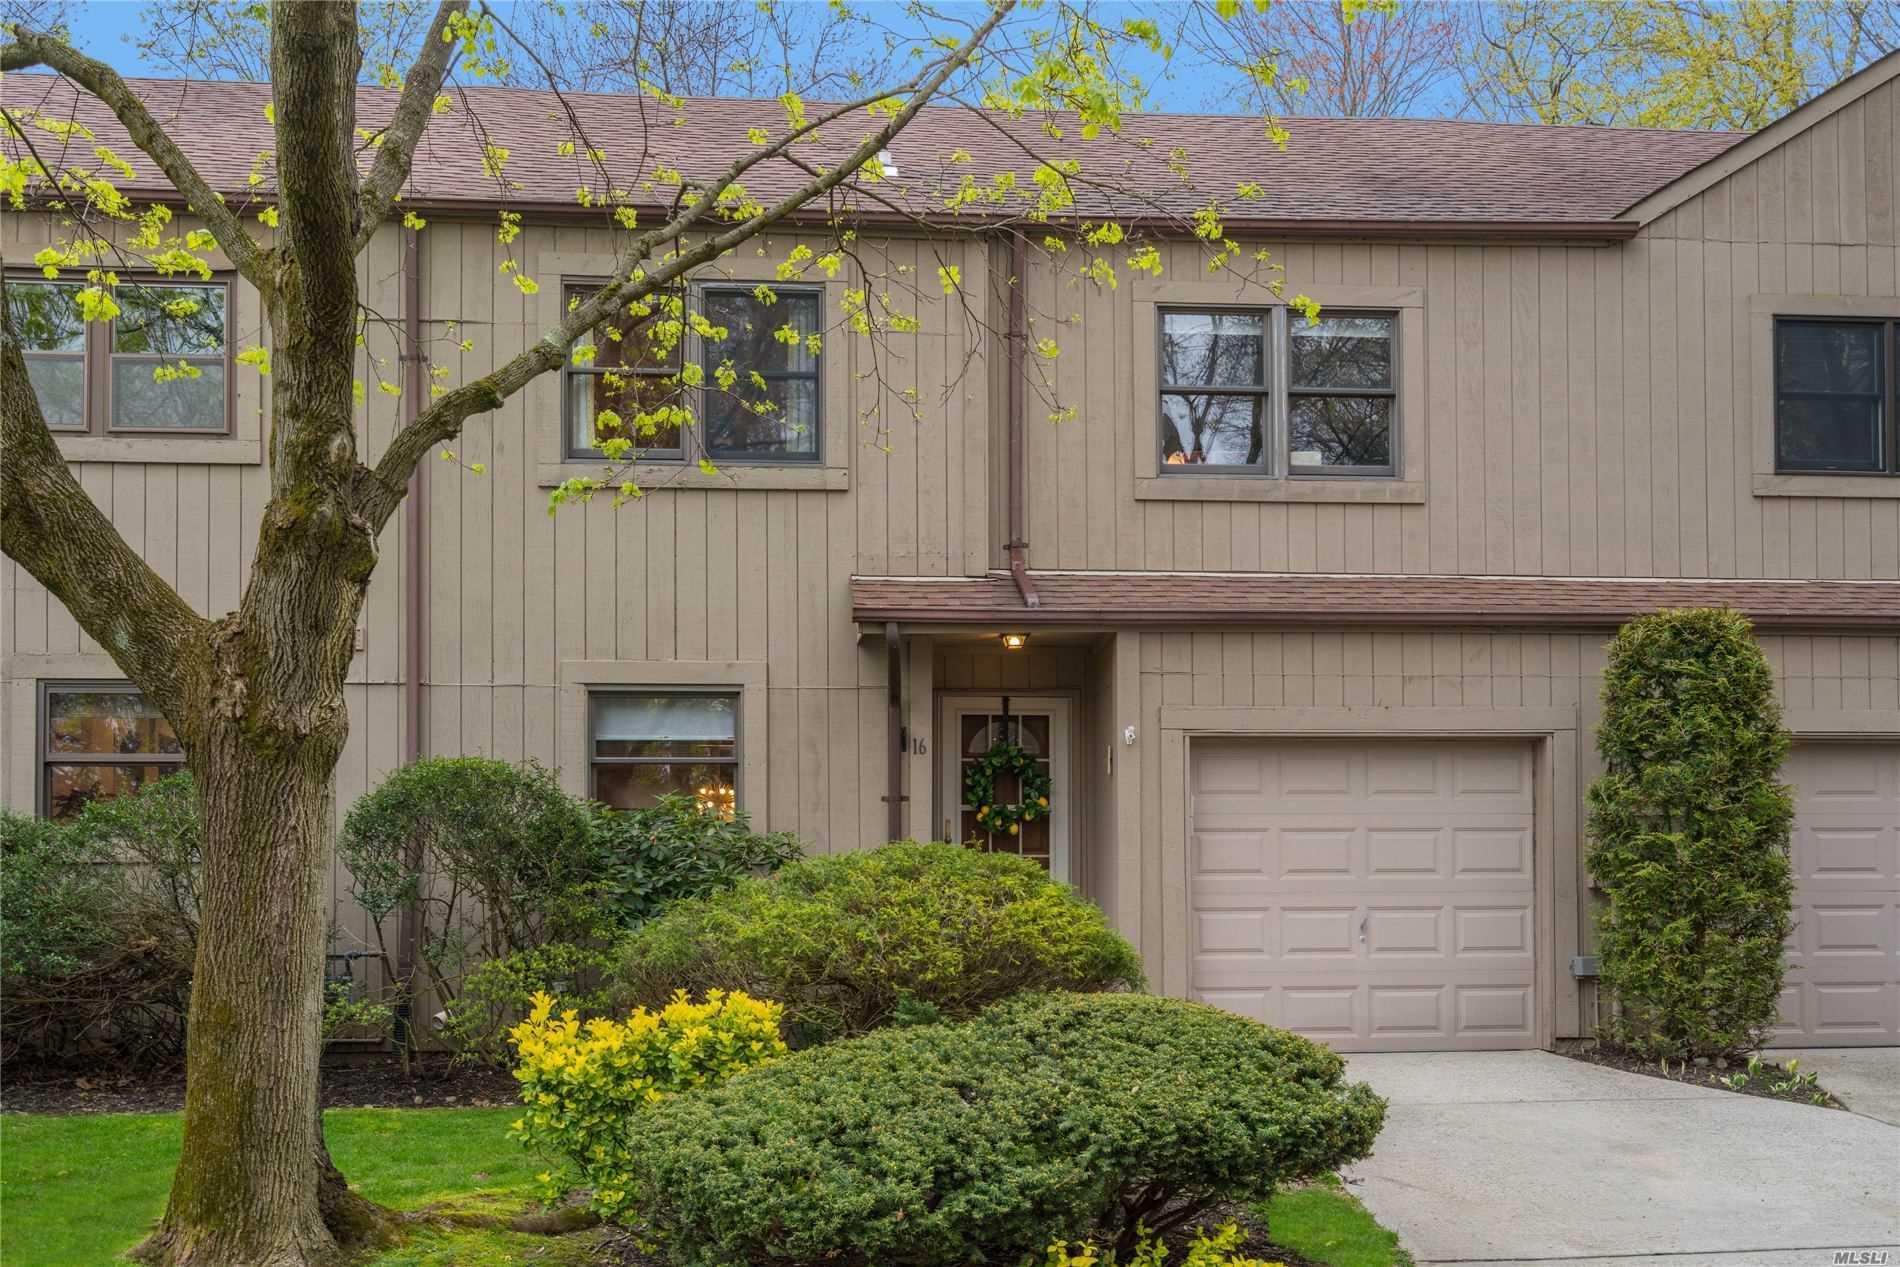 Property for sale at 16 High Oak Ct, Huntington NY 11743, Huntington,  New York 11743